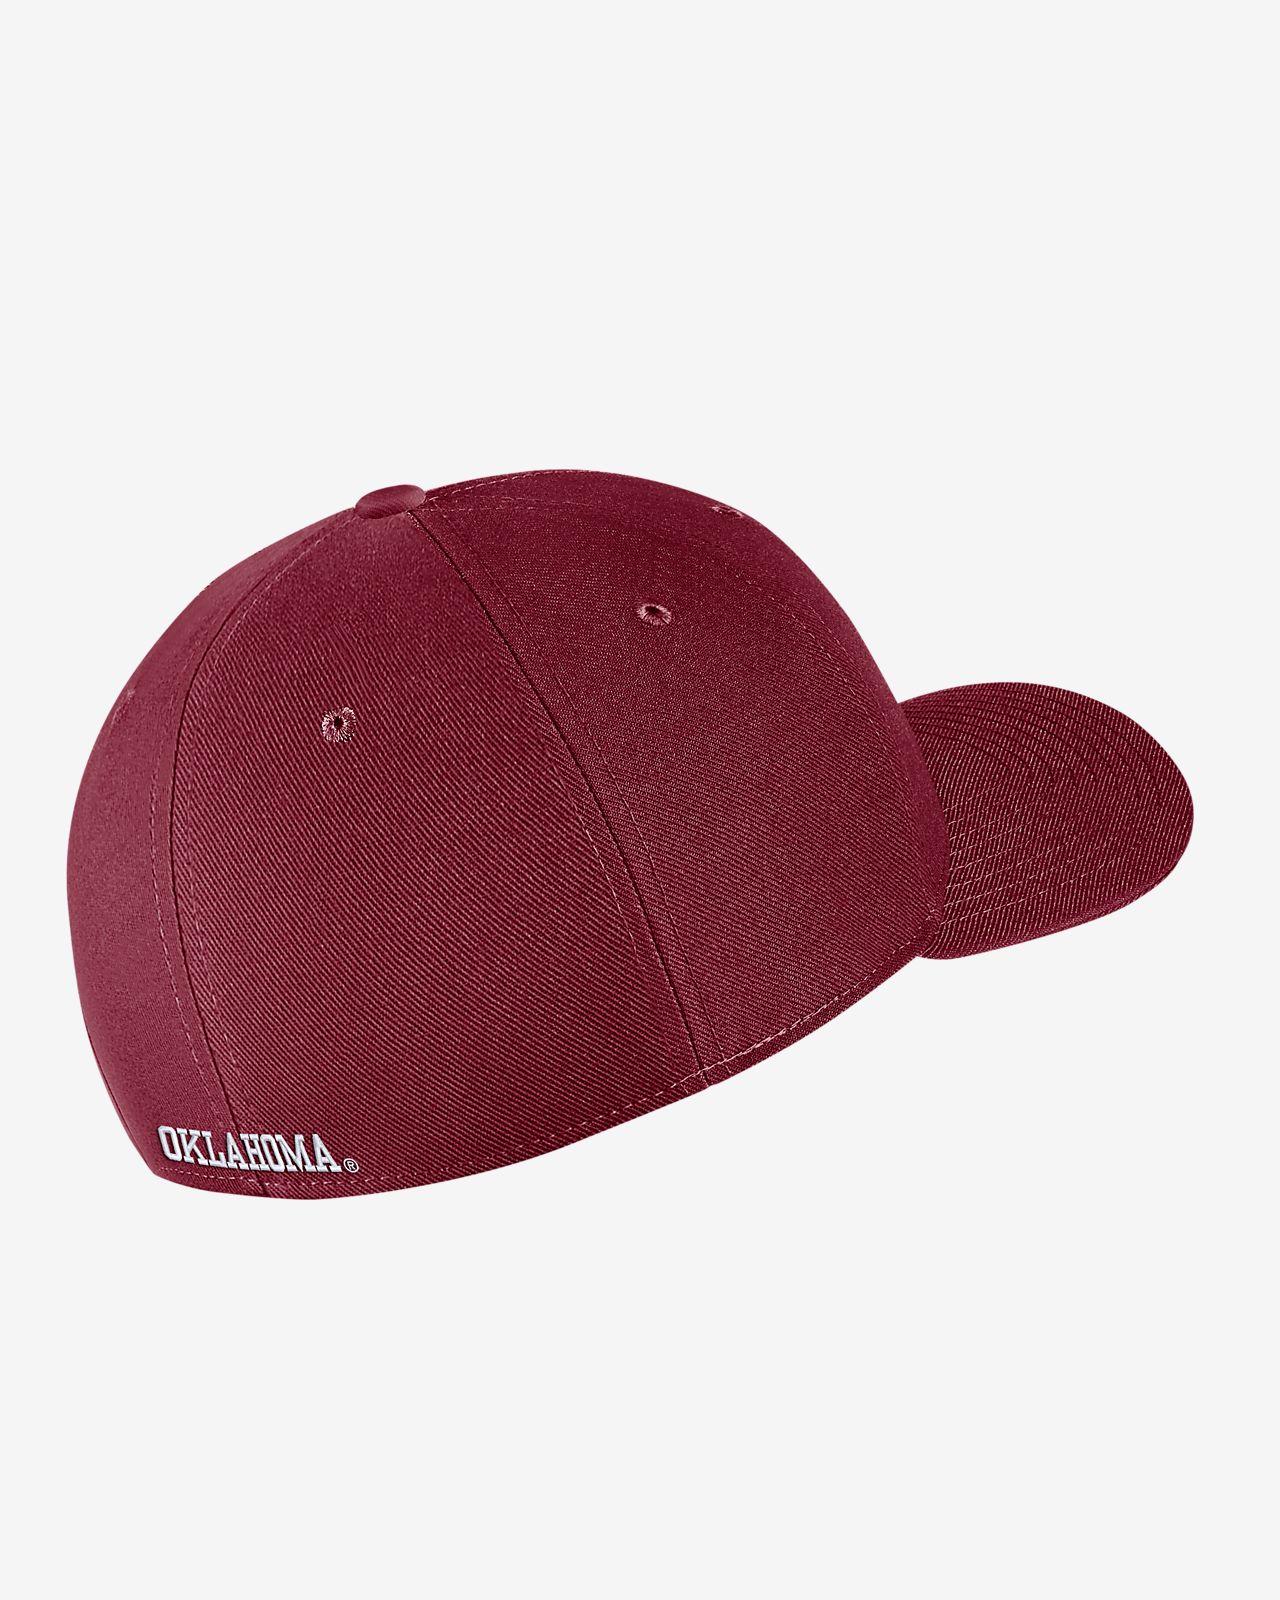 Nike College Dri-FIT Classic99 Swoosh Flex (Oklahoma) Fitted Hat ... bcca7094a962